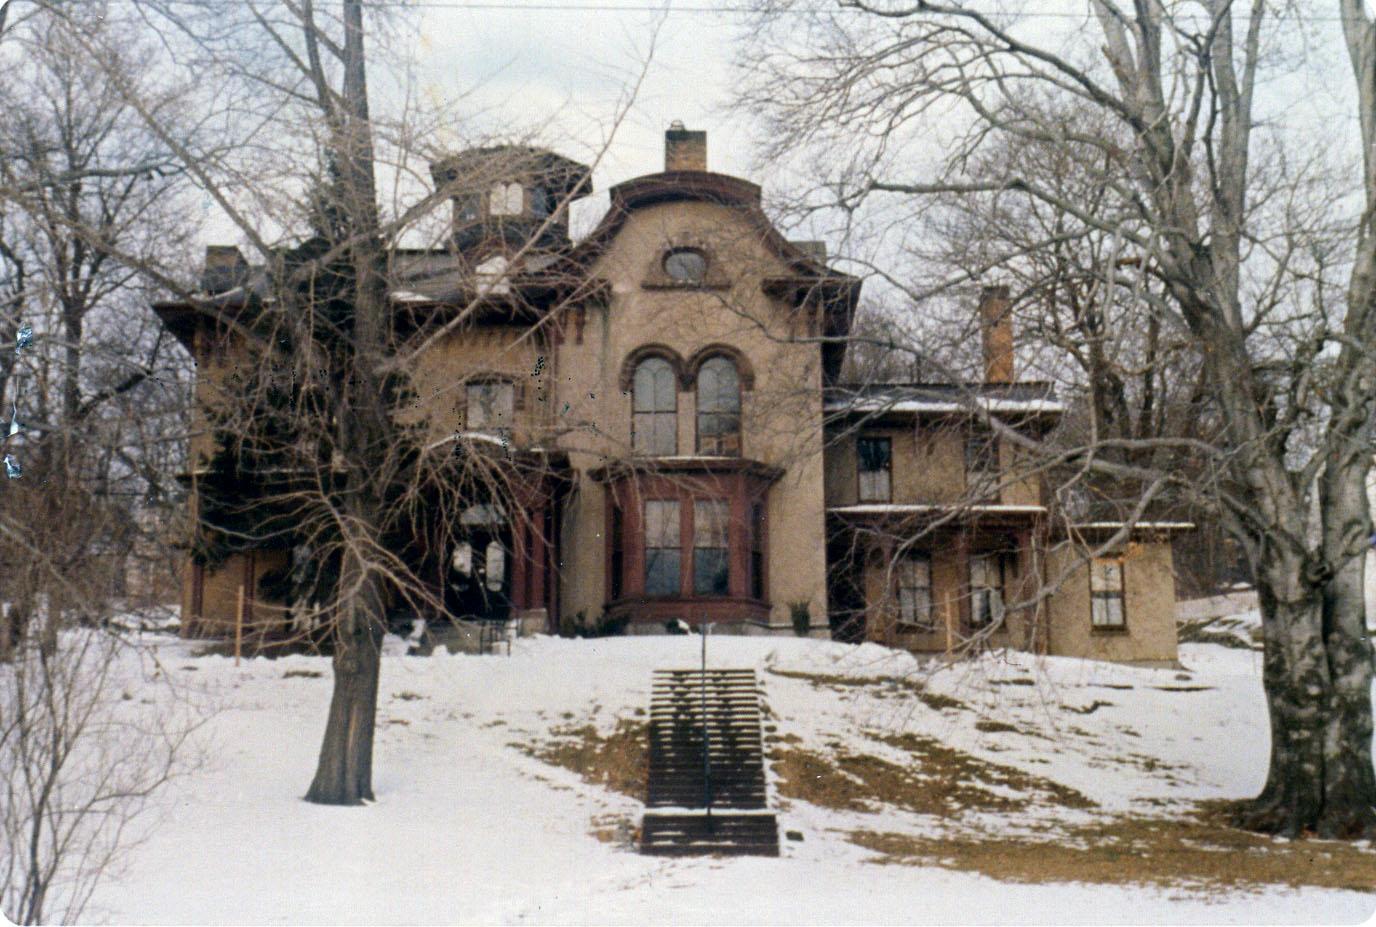 William Flagg Homer House BLM 209